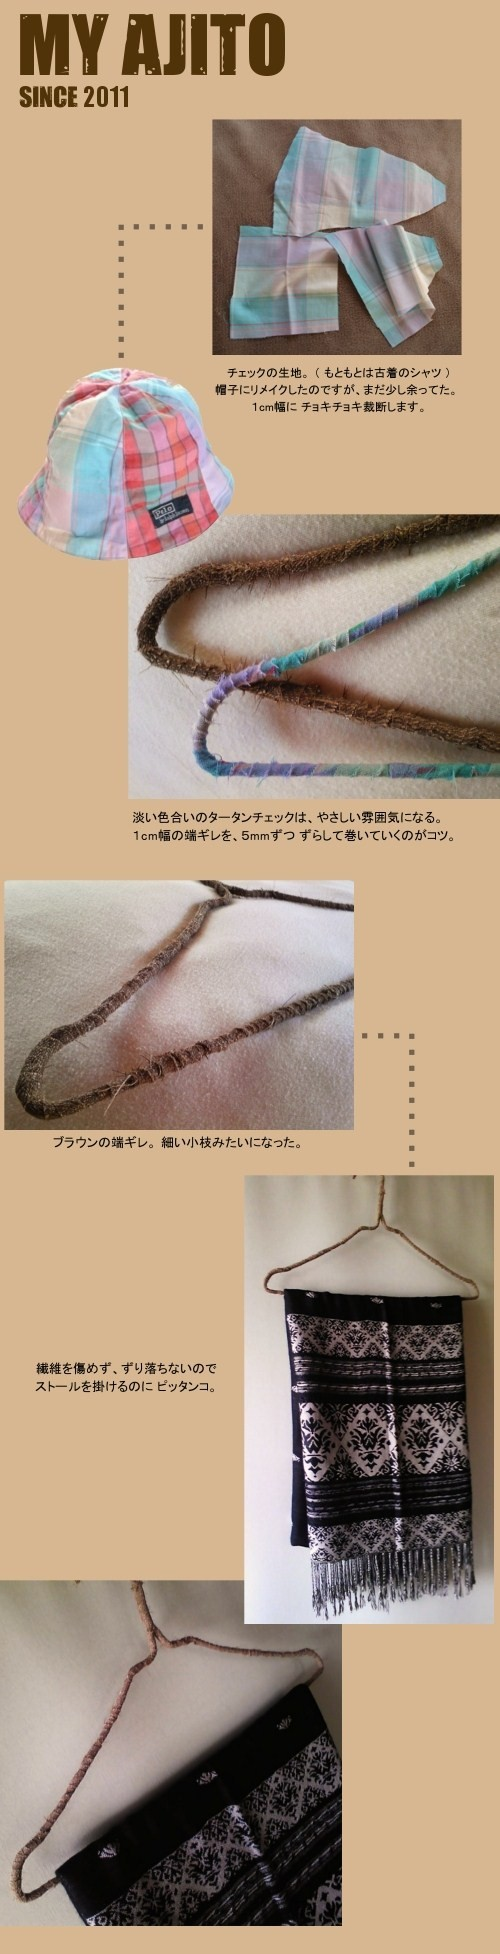 hang_3.jpg